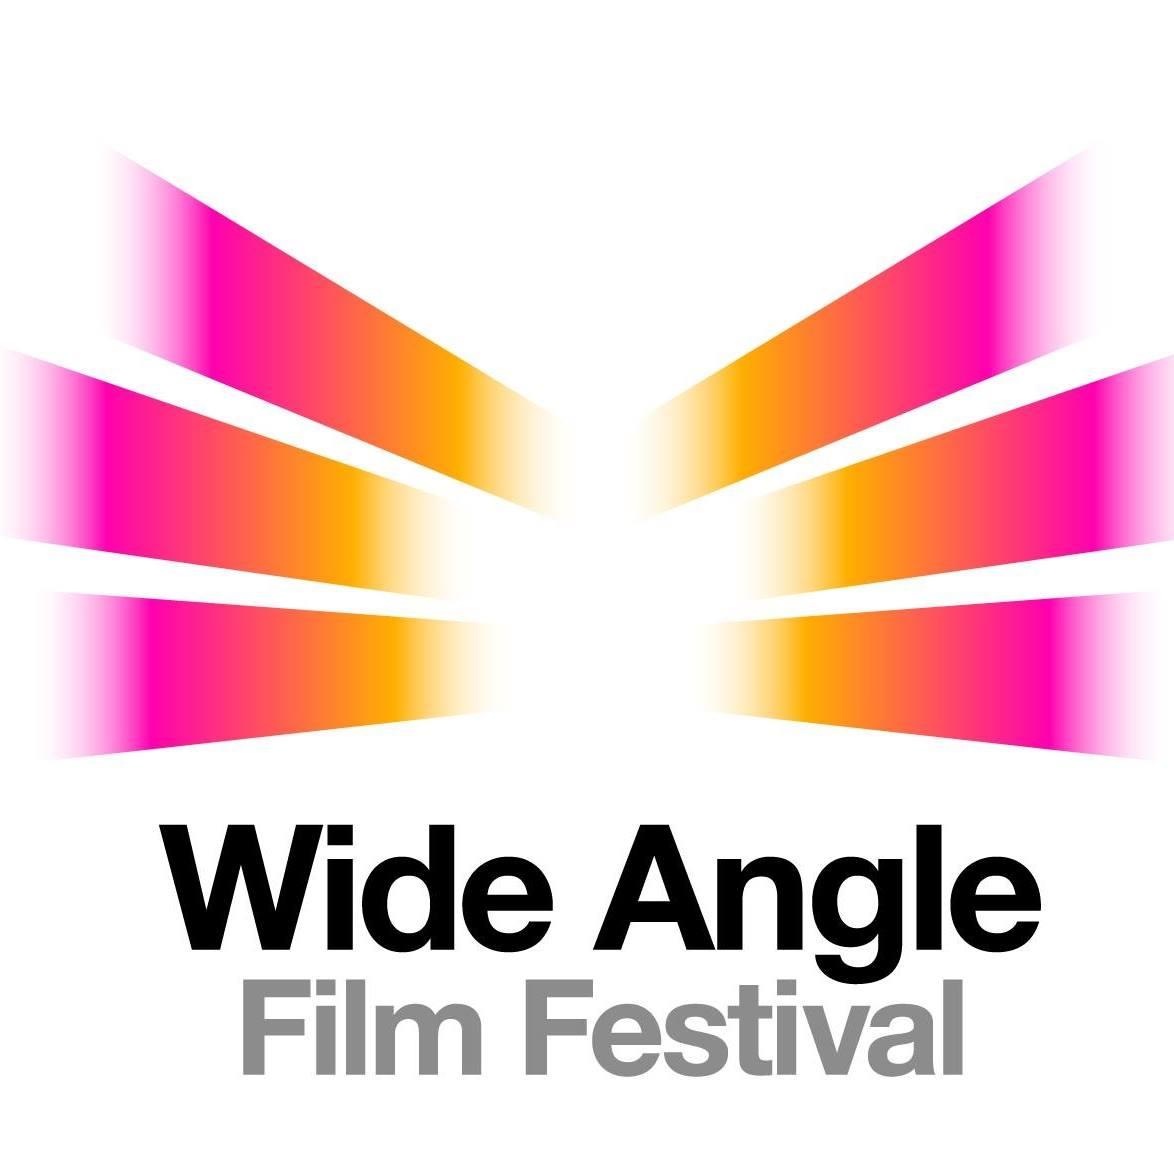 wide angle film festival